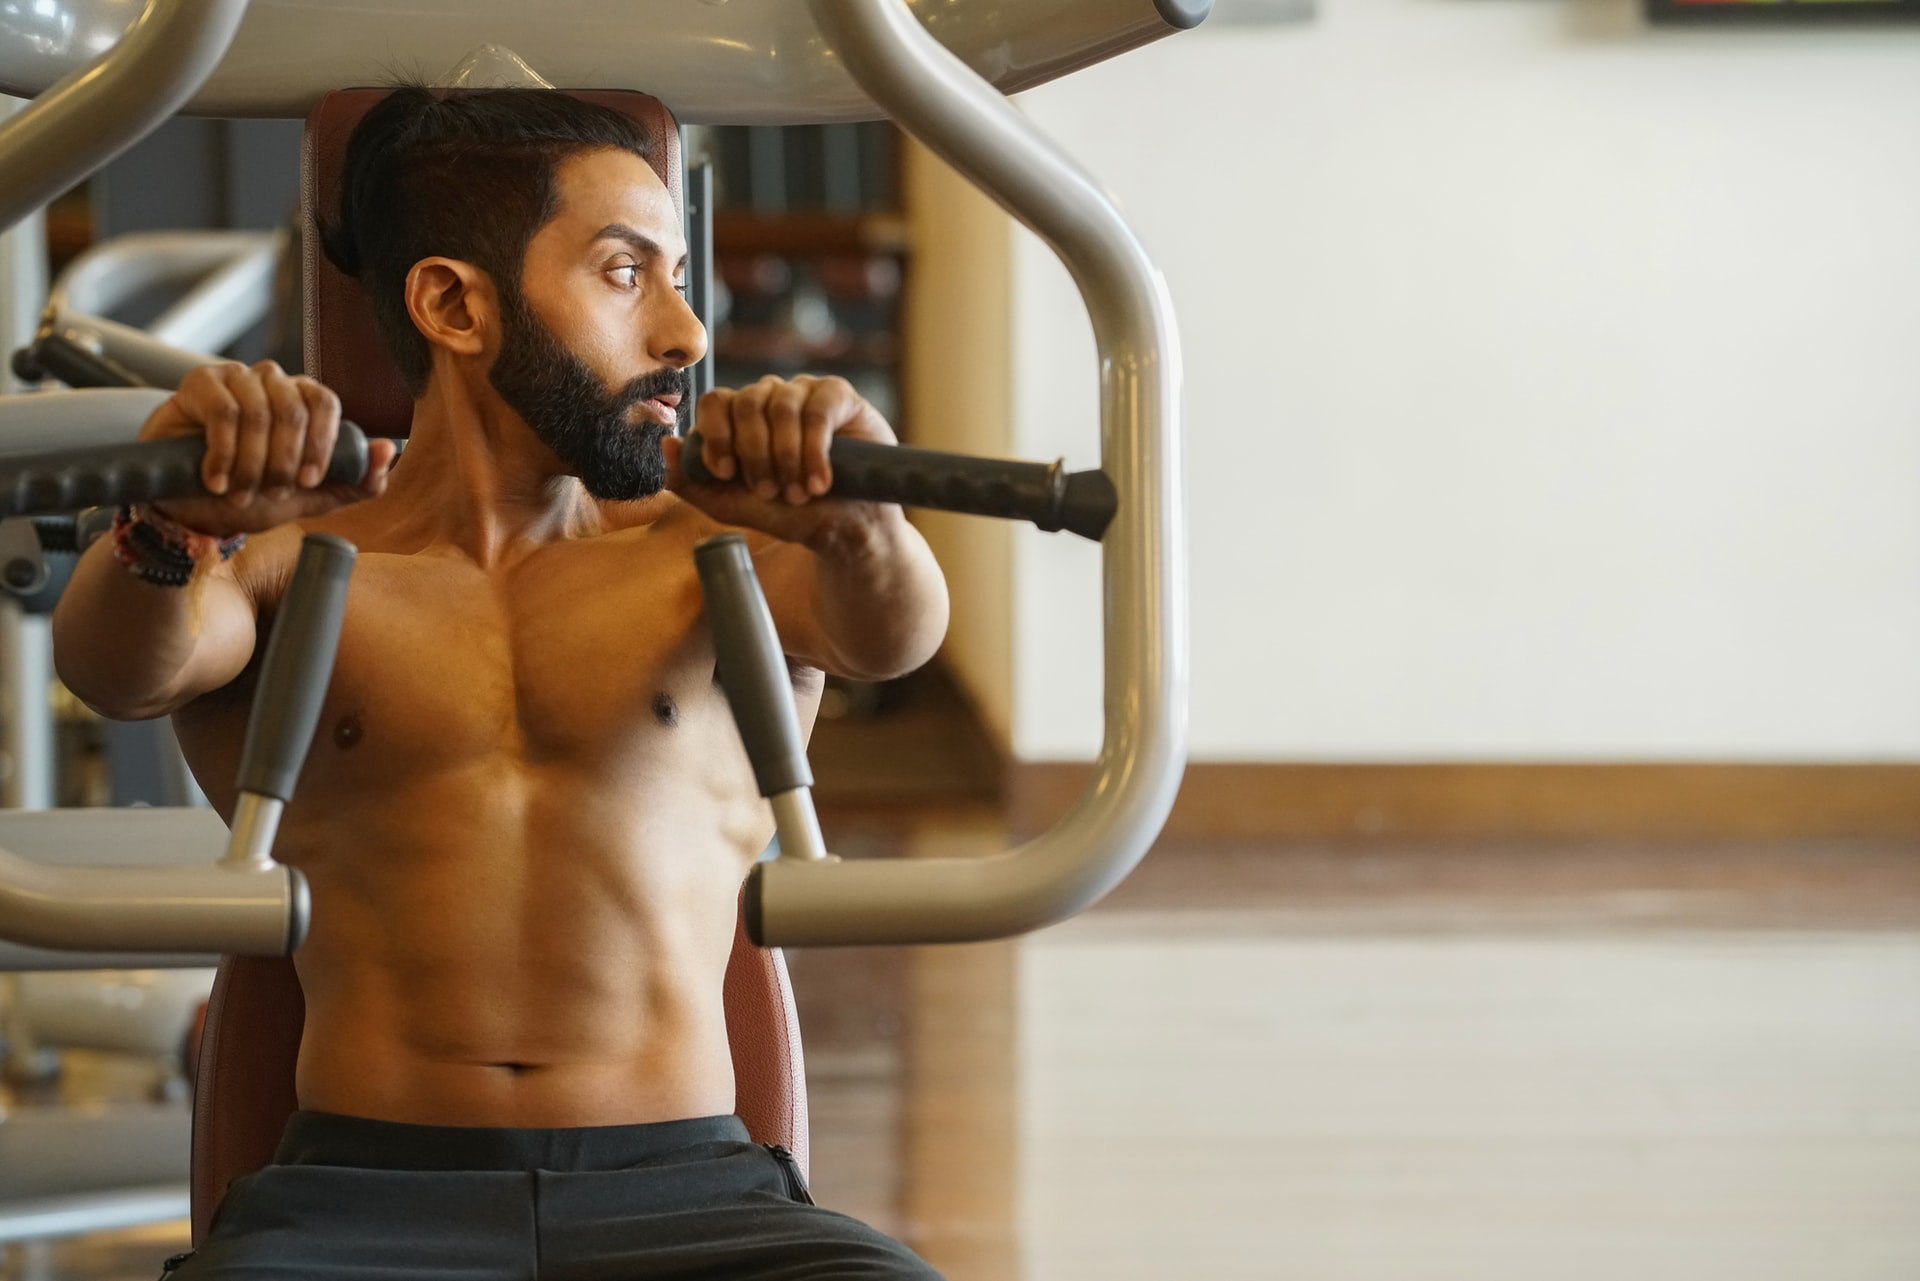 Weider vs total gym